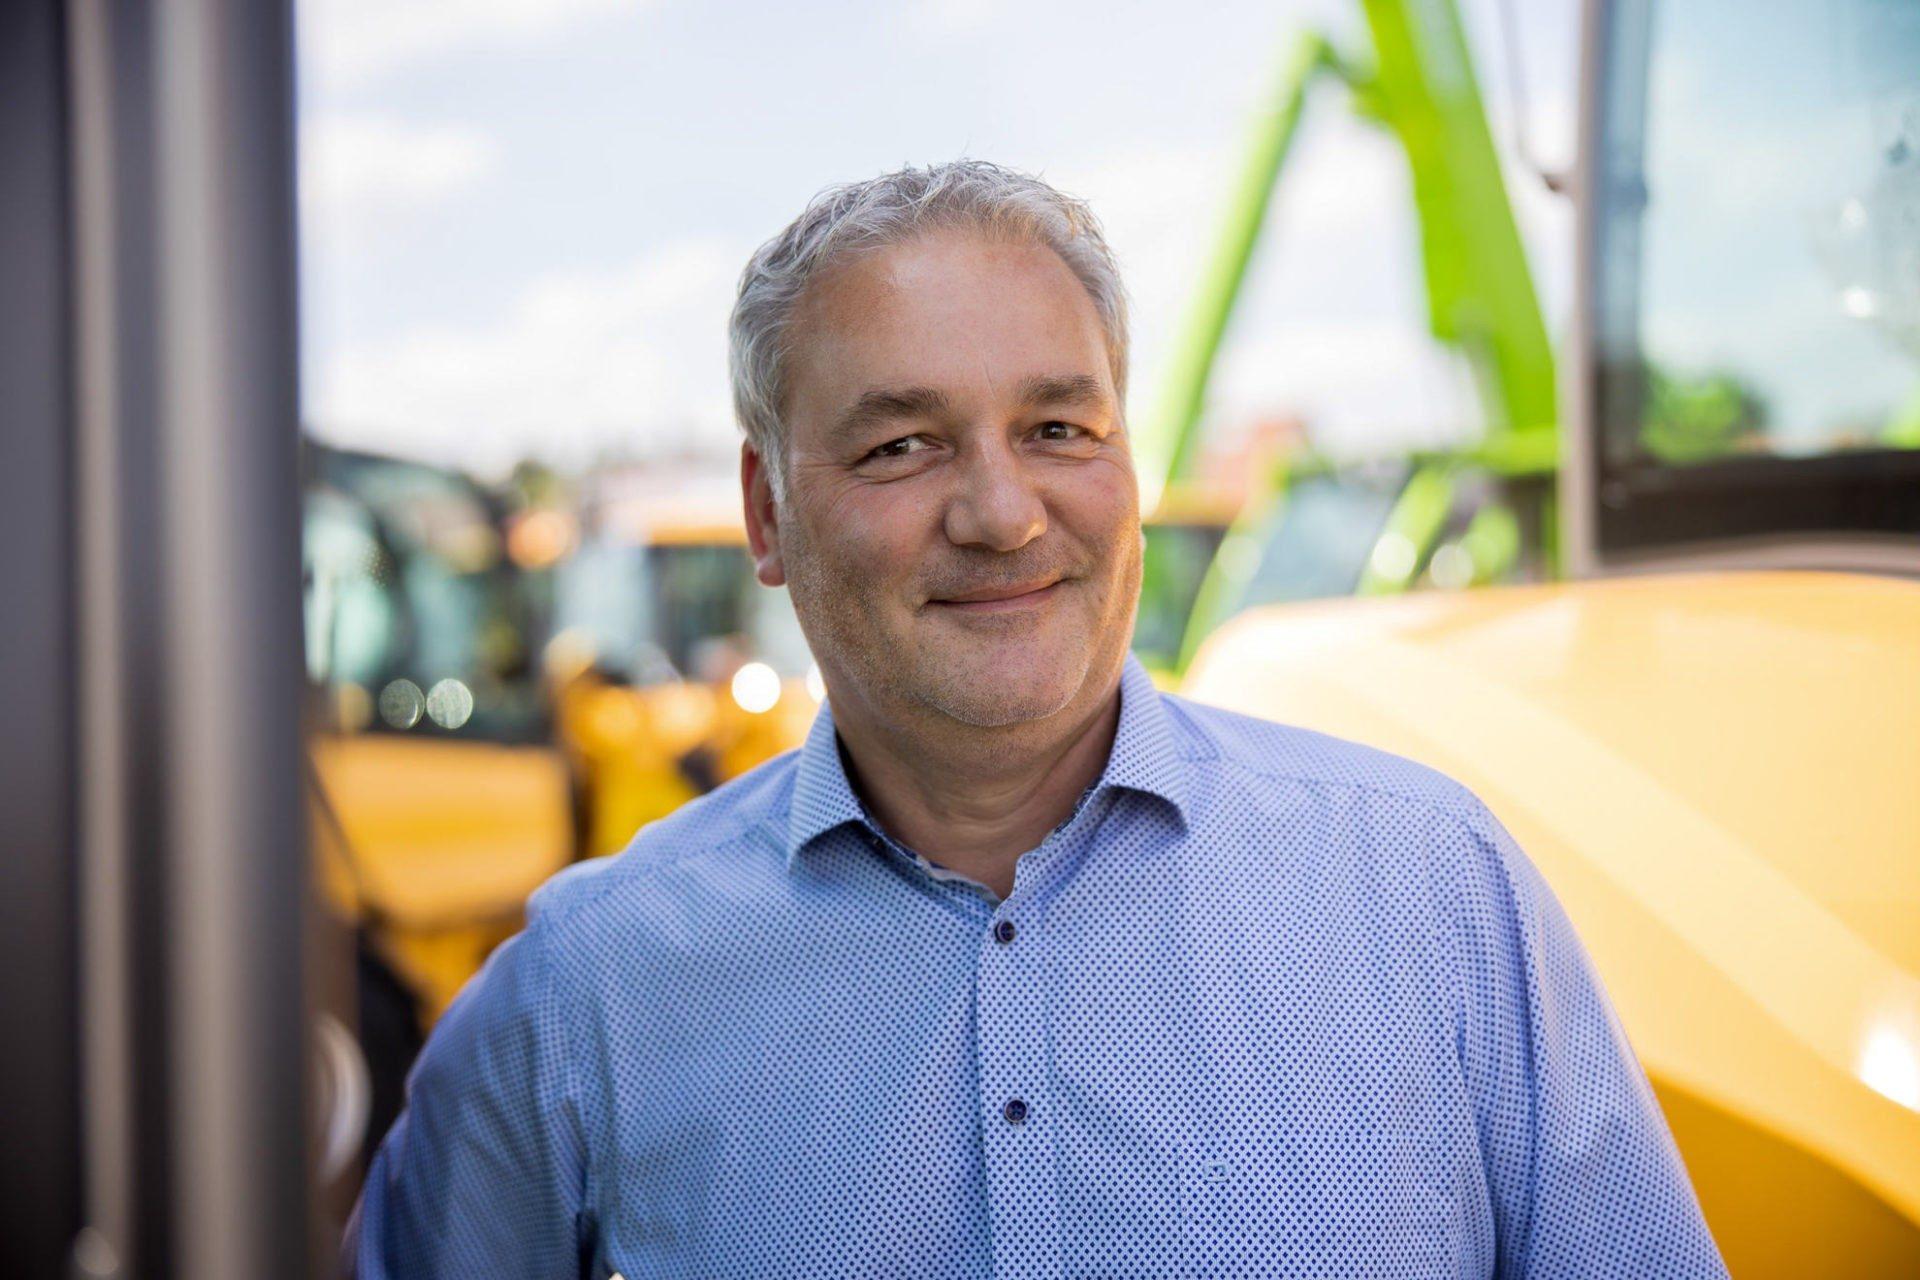 Martin Hermanutz